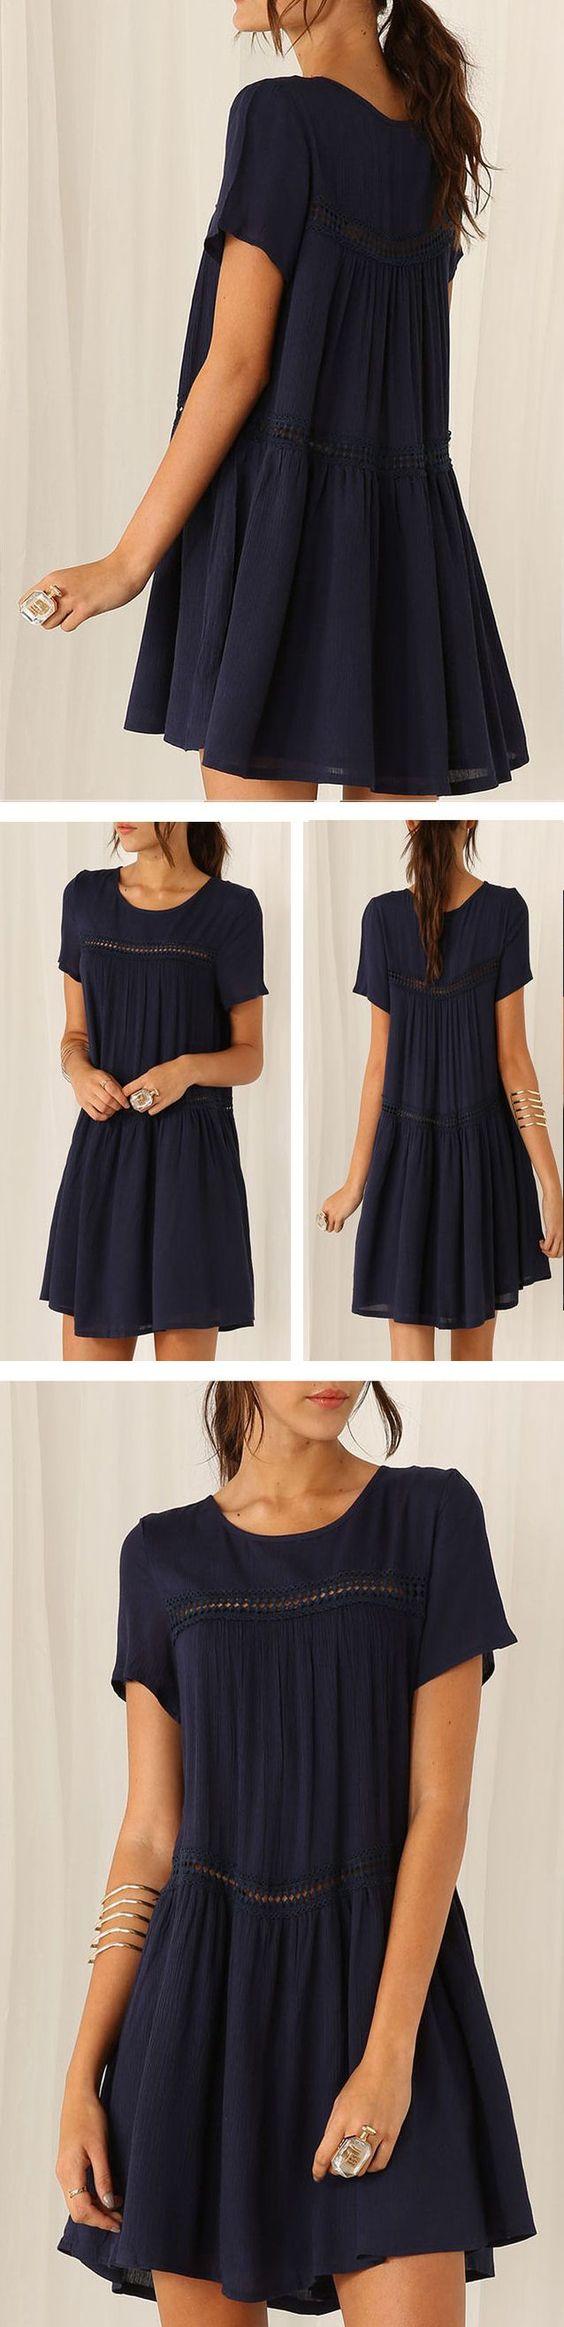 Navy Short Sleeve Shift Dress ❤︎